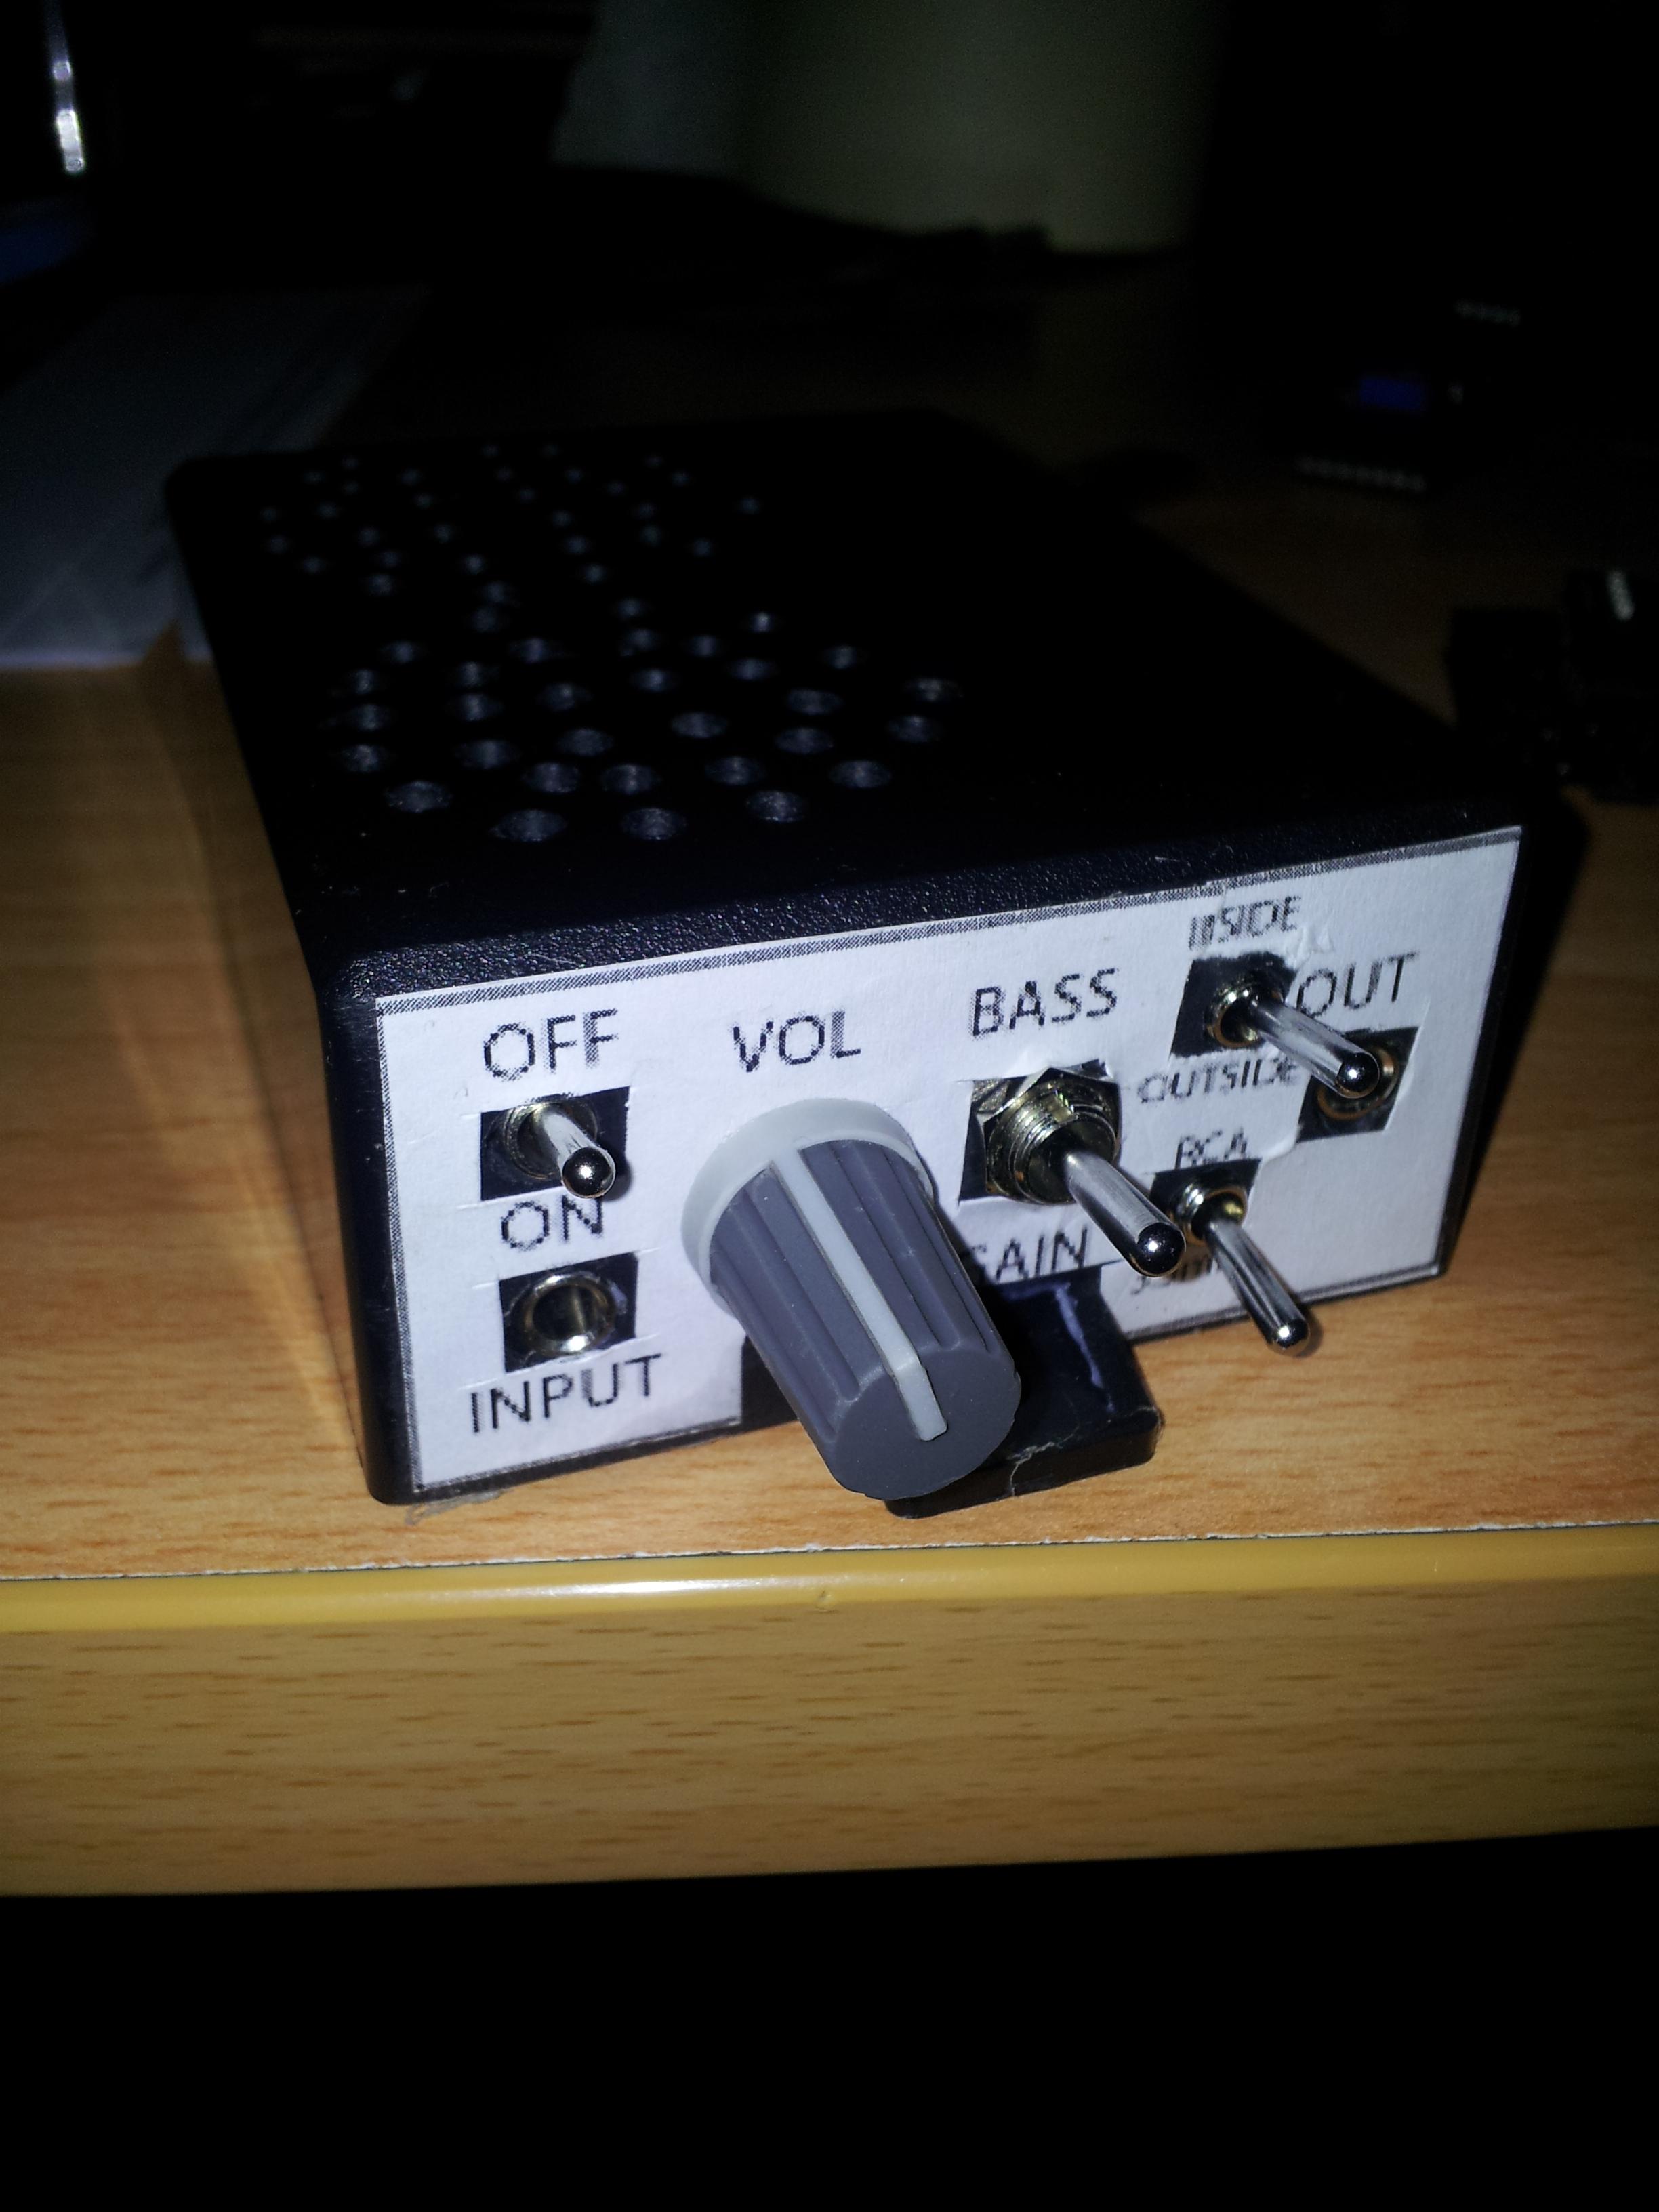 Pocket Stereo Amplifier